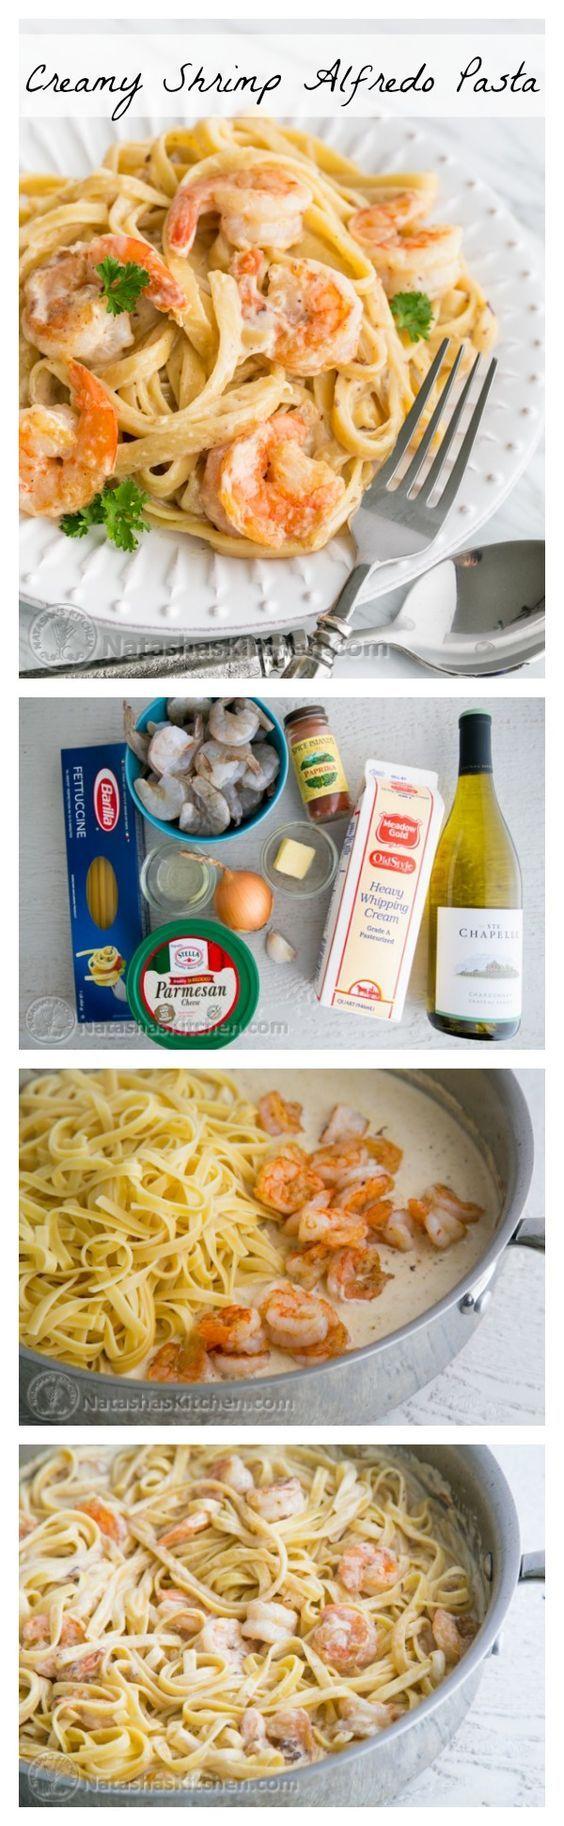 Creamy Shrimp Alfredo Pasta.   Pin now, enjoy later!